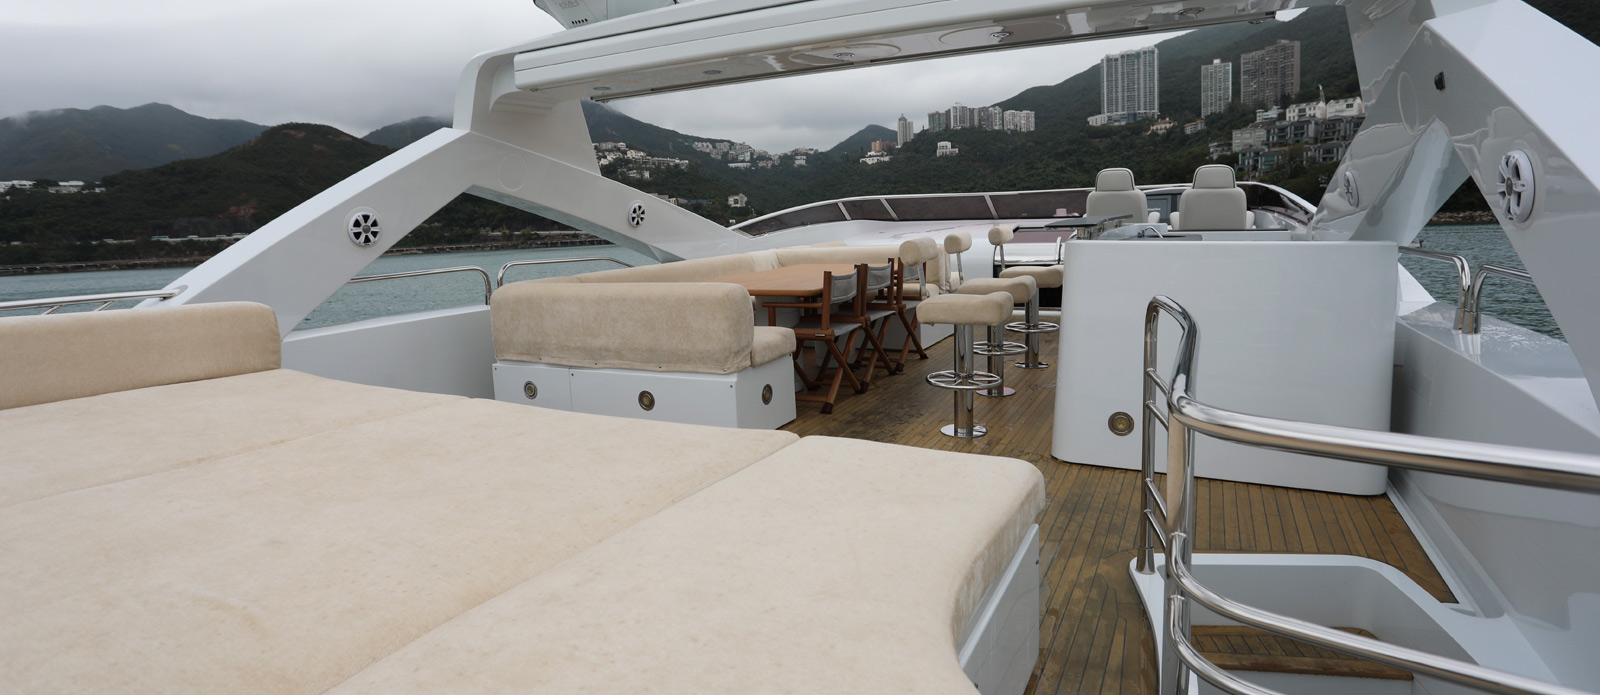 Sunseeker-30-Metre-Yacht-Coraysa-Flybridge-2